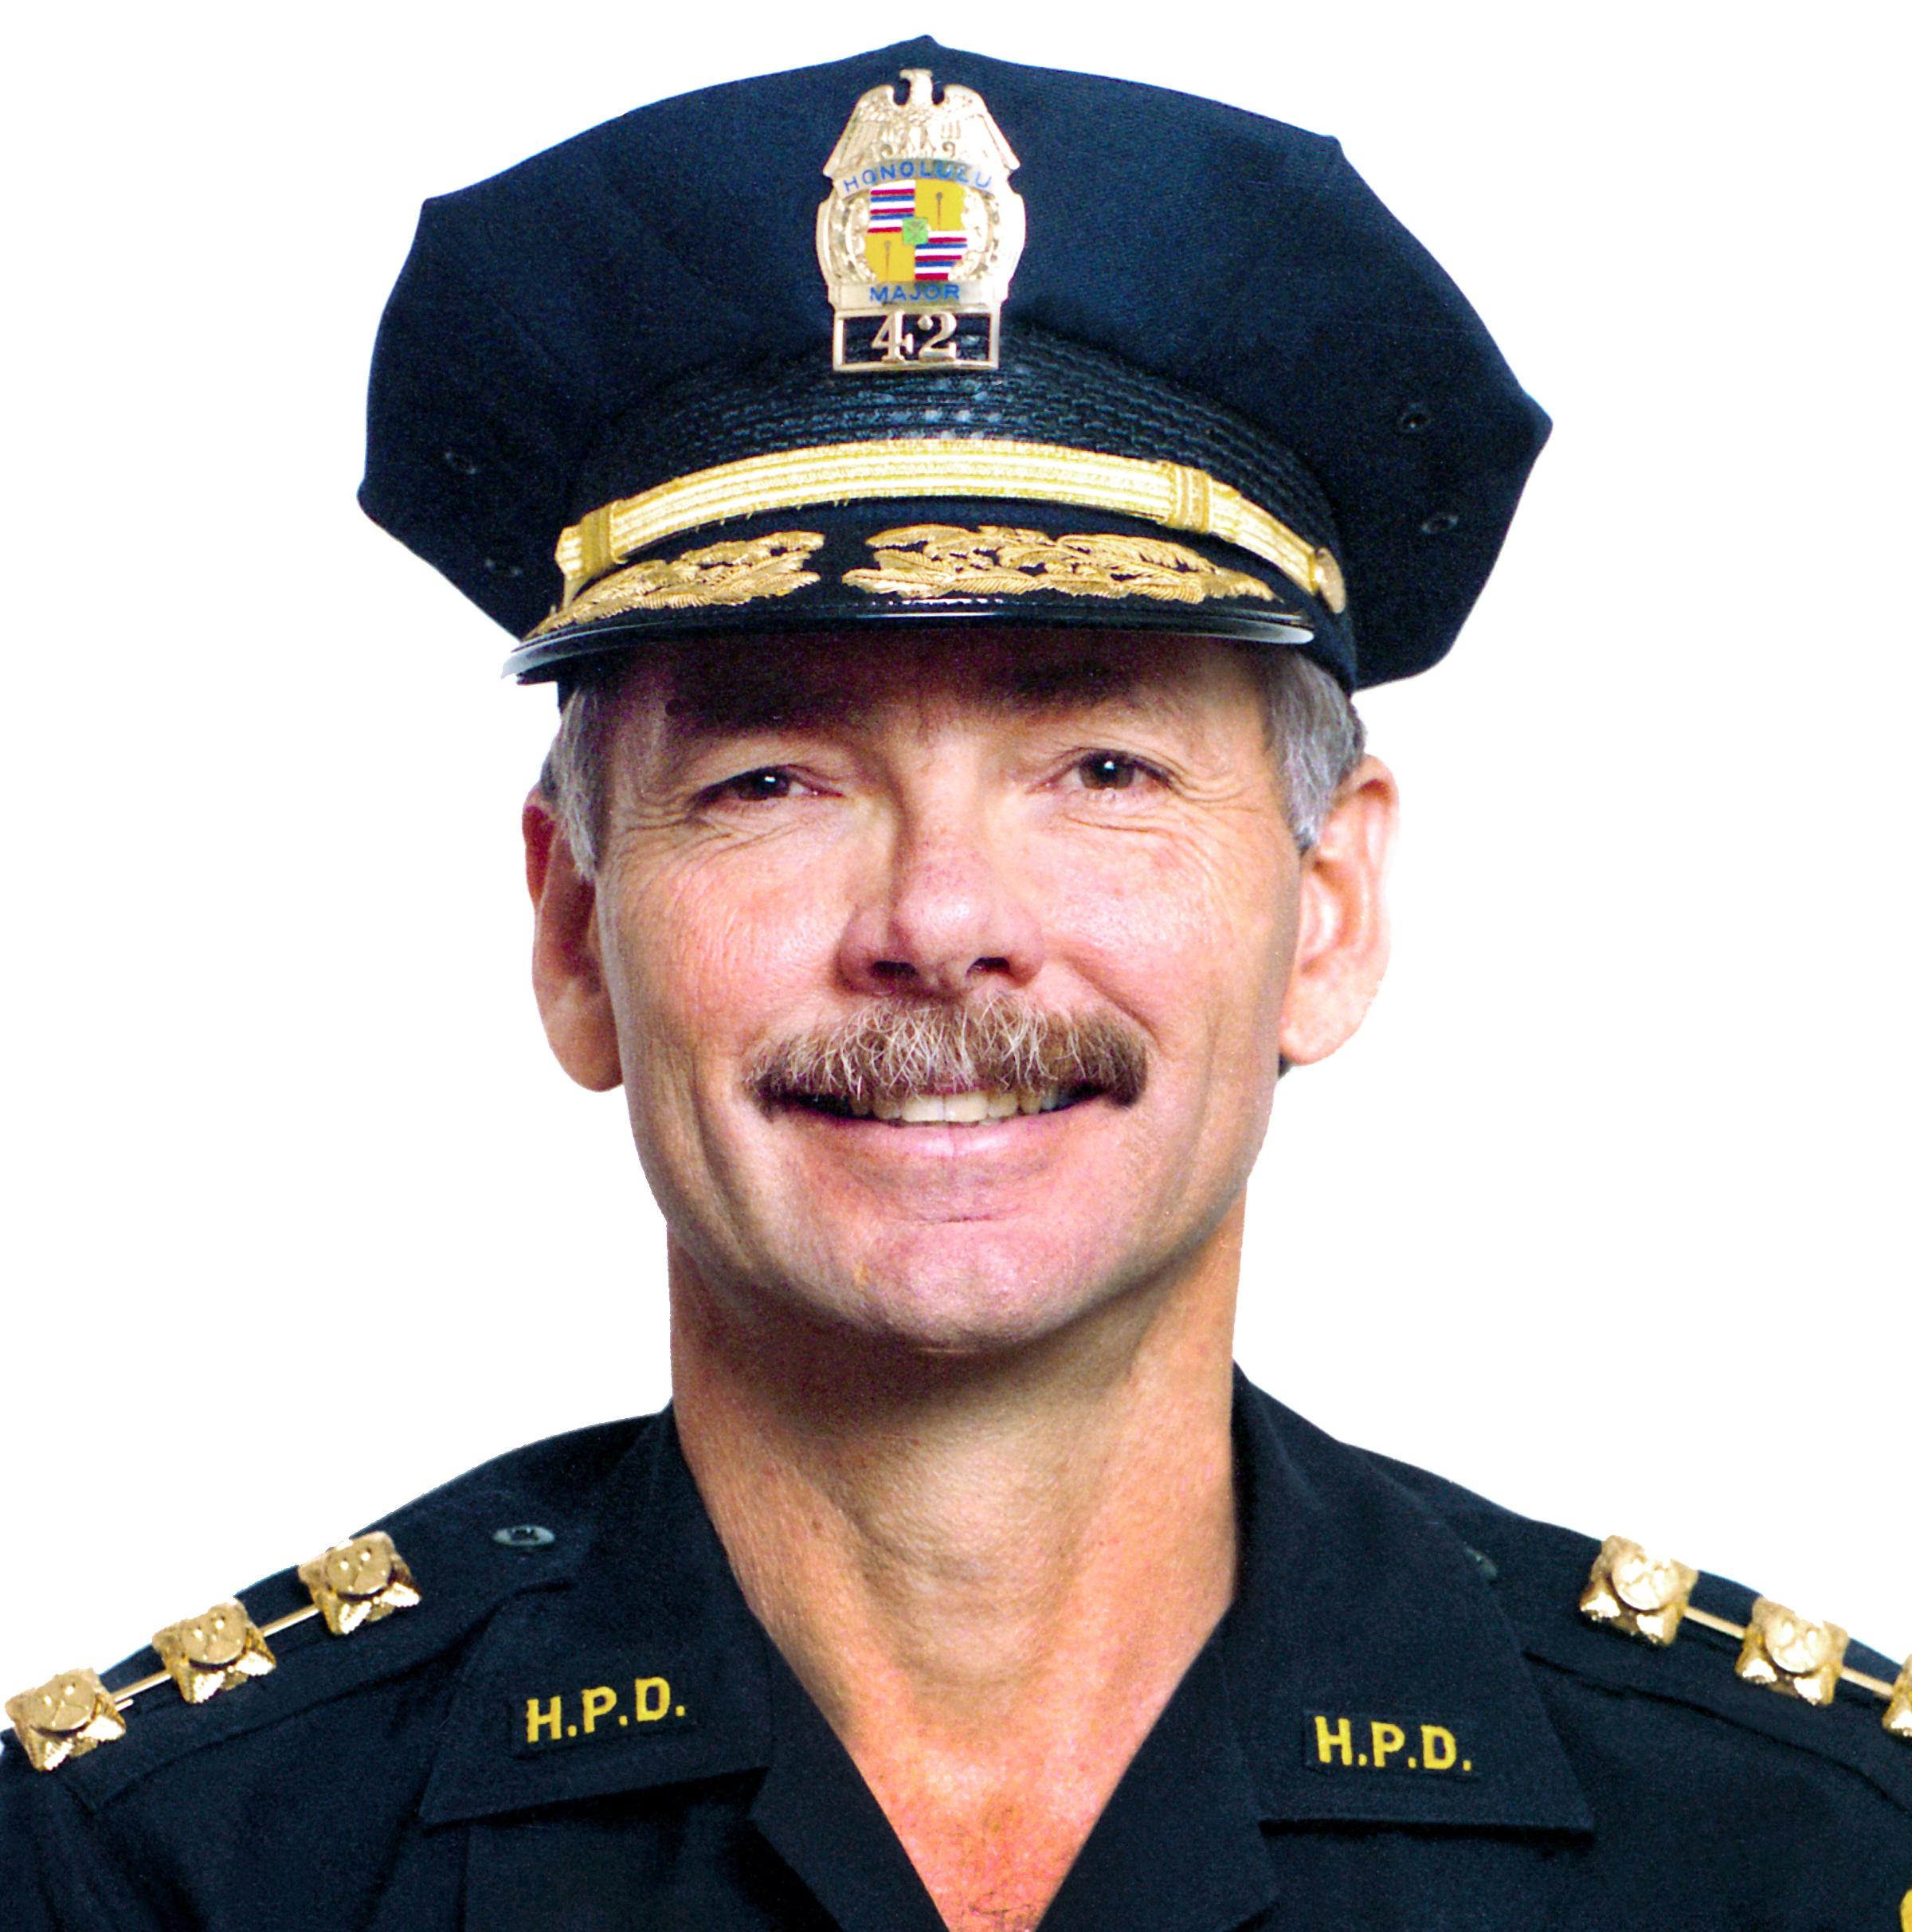 Major Marc W. Greenwell